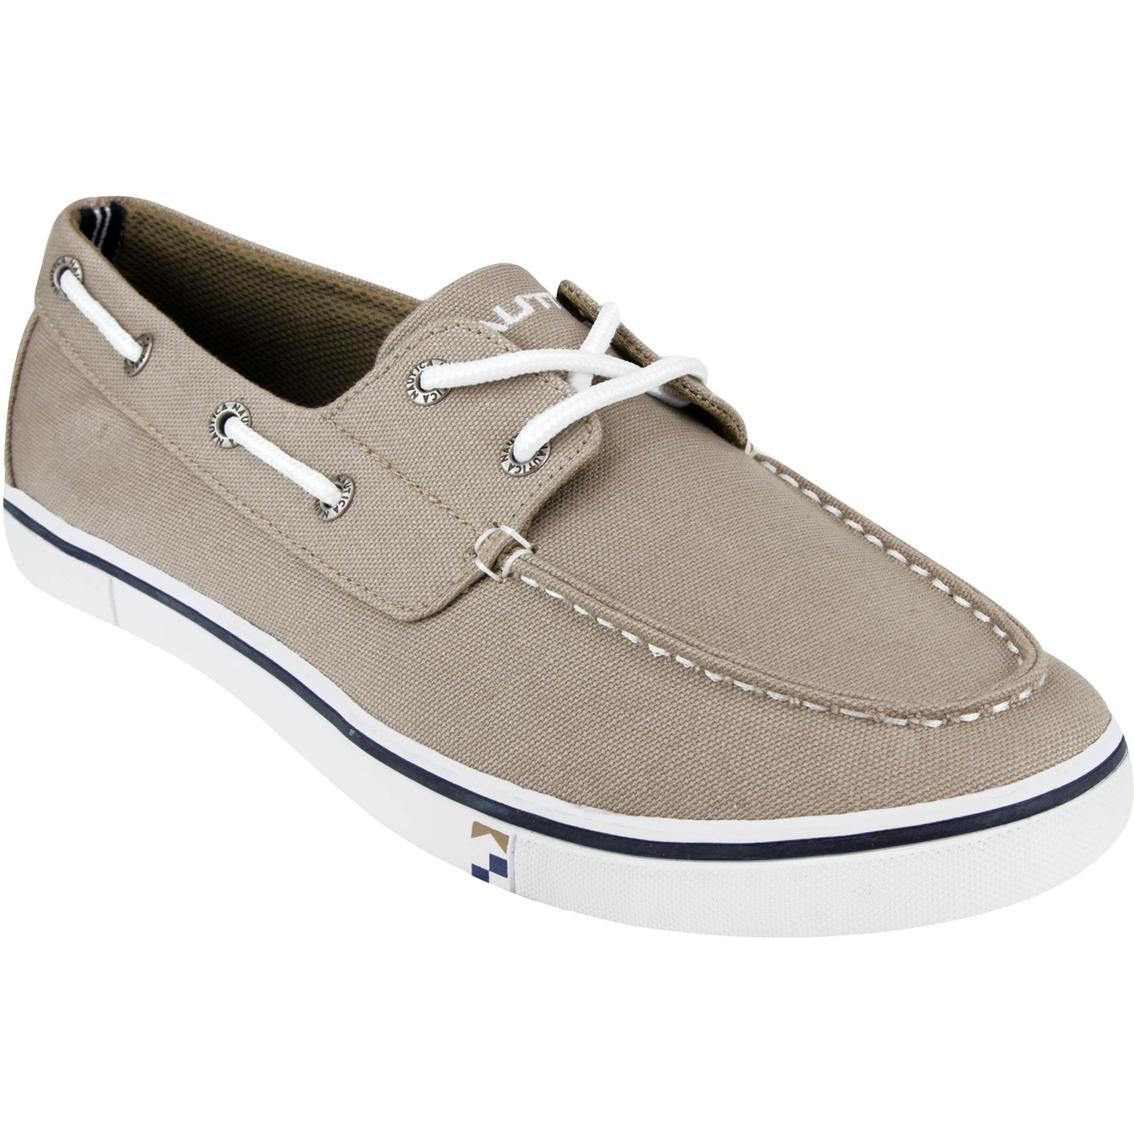 Nautica Men's Galley Canvas Boat Shoes